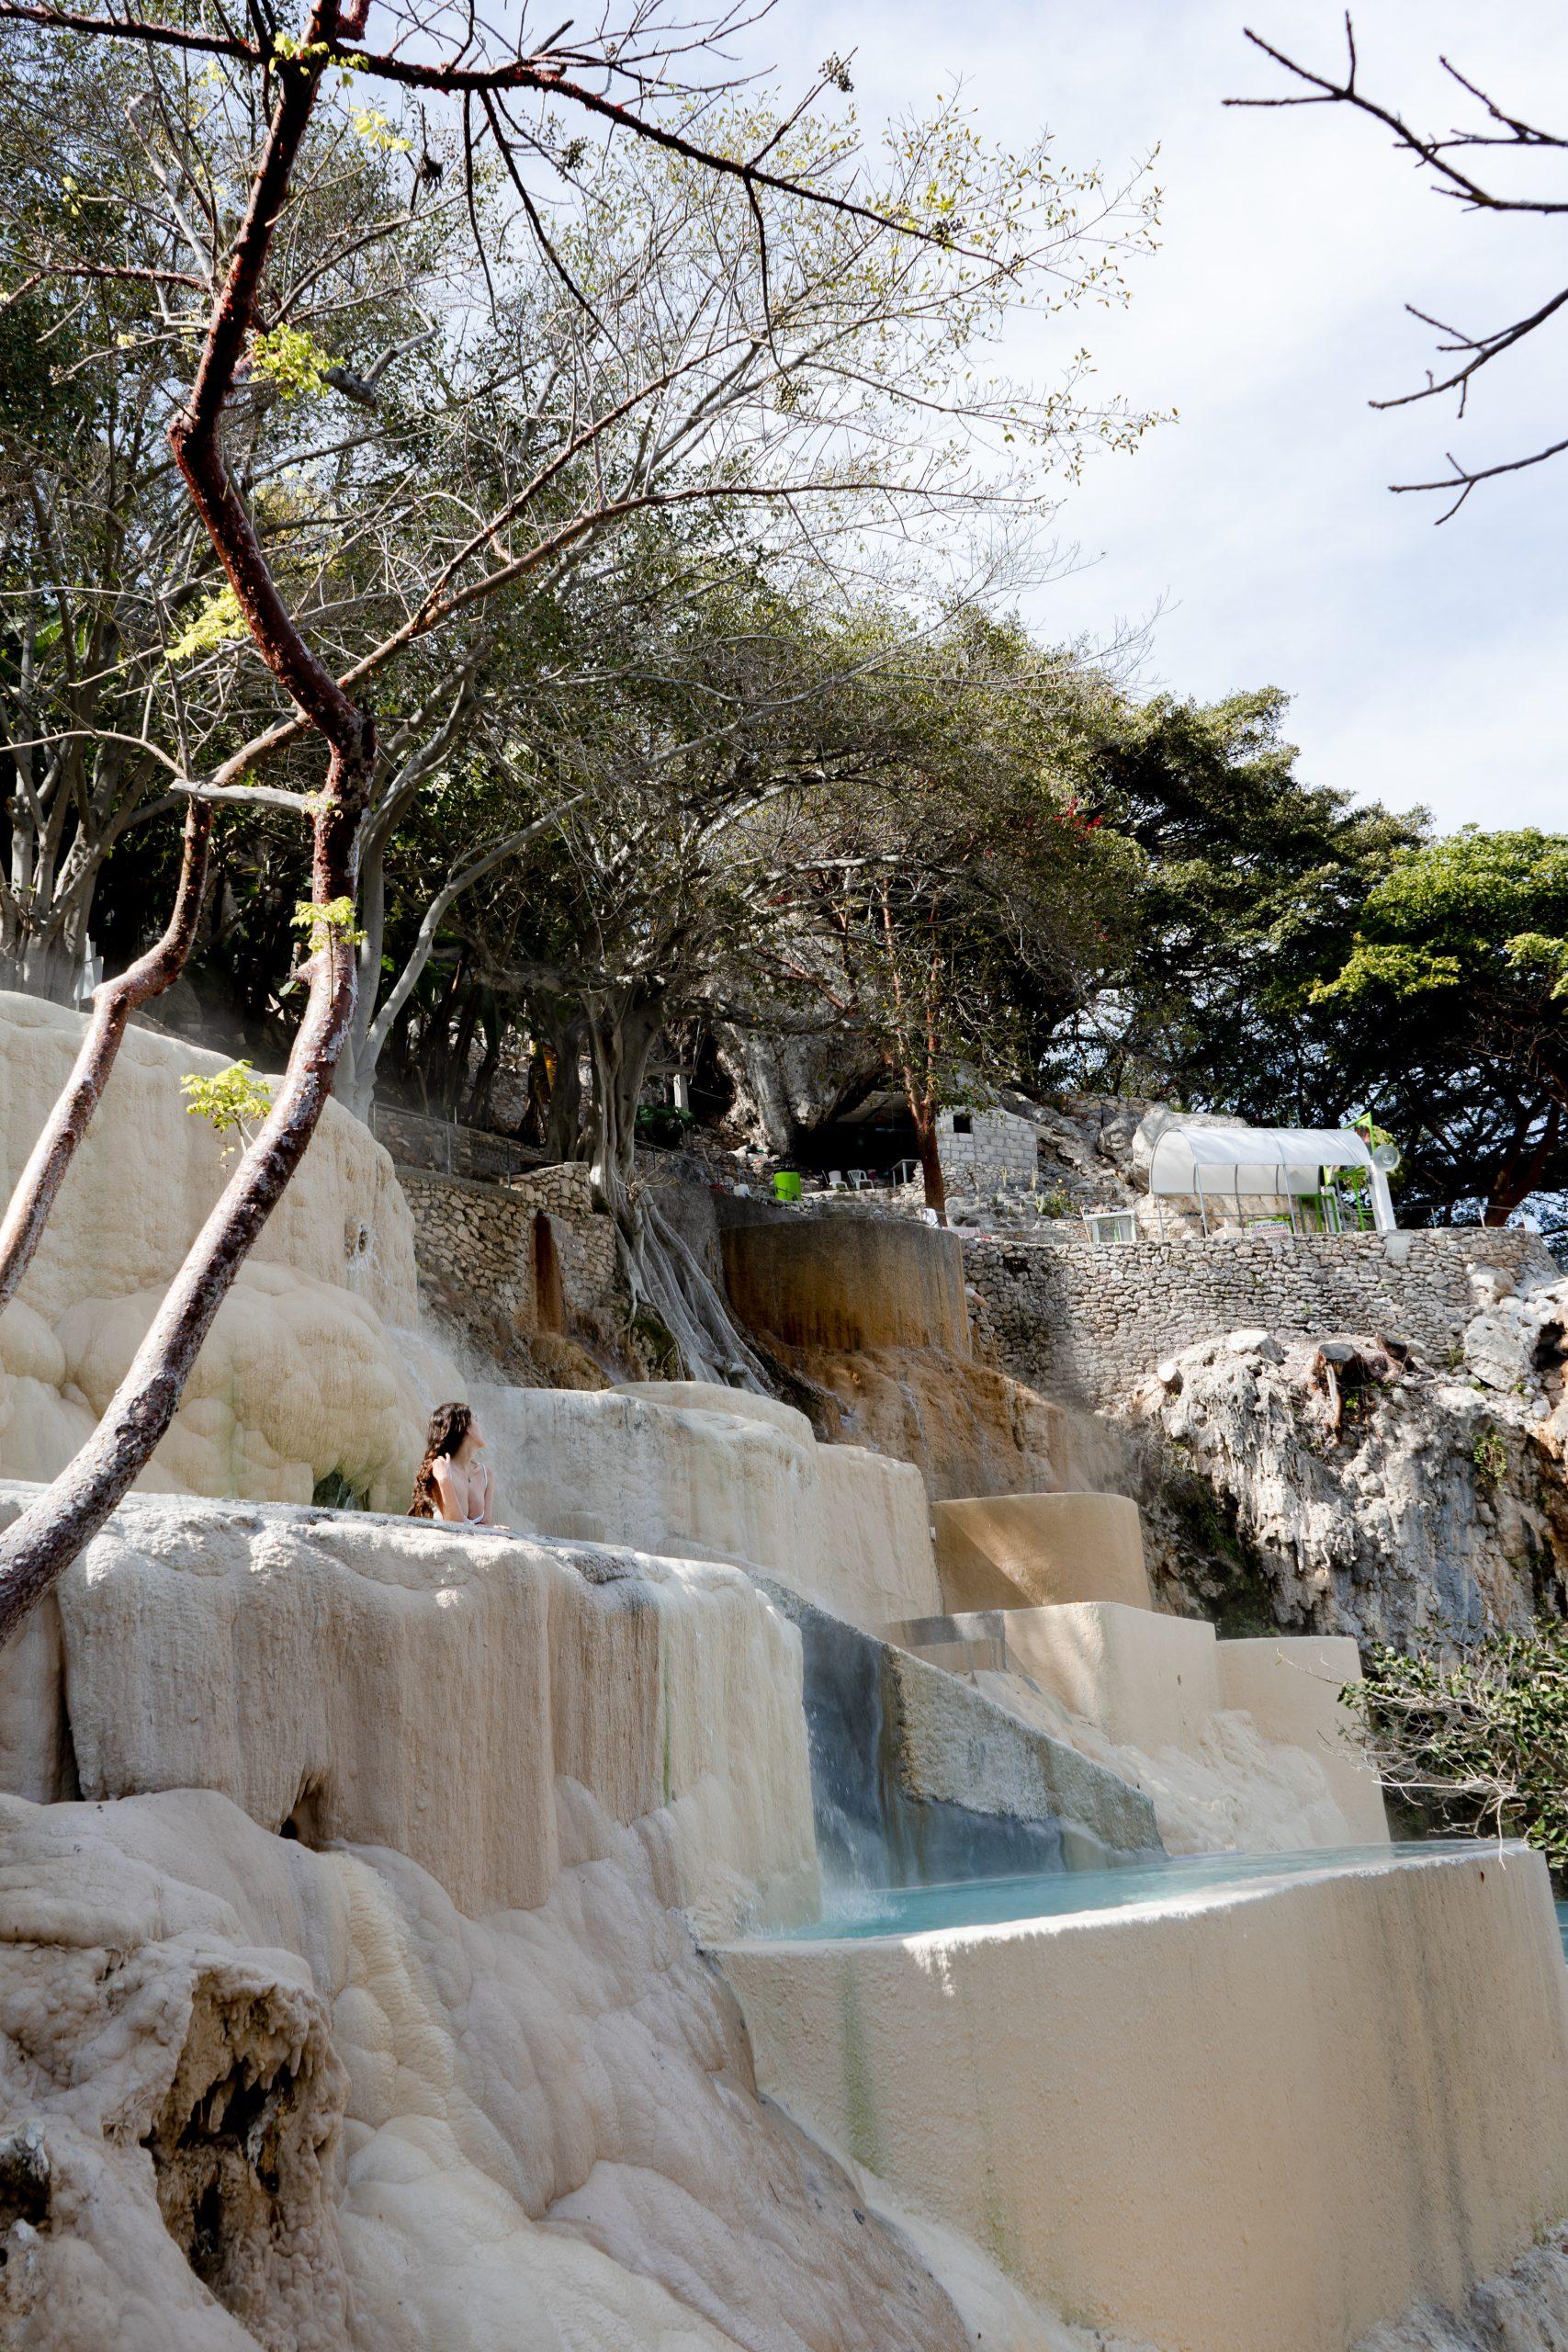 grutas tolantongo hot springs thermal pools white cliffside canyon hidalgo mexico brunette woman eva phan ecotourism attraction mexico city